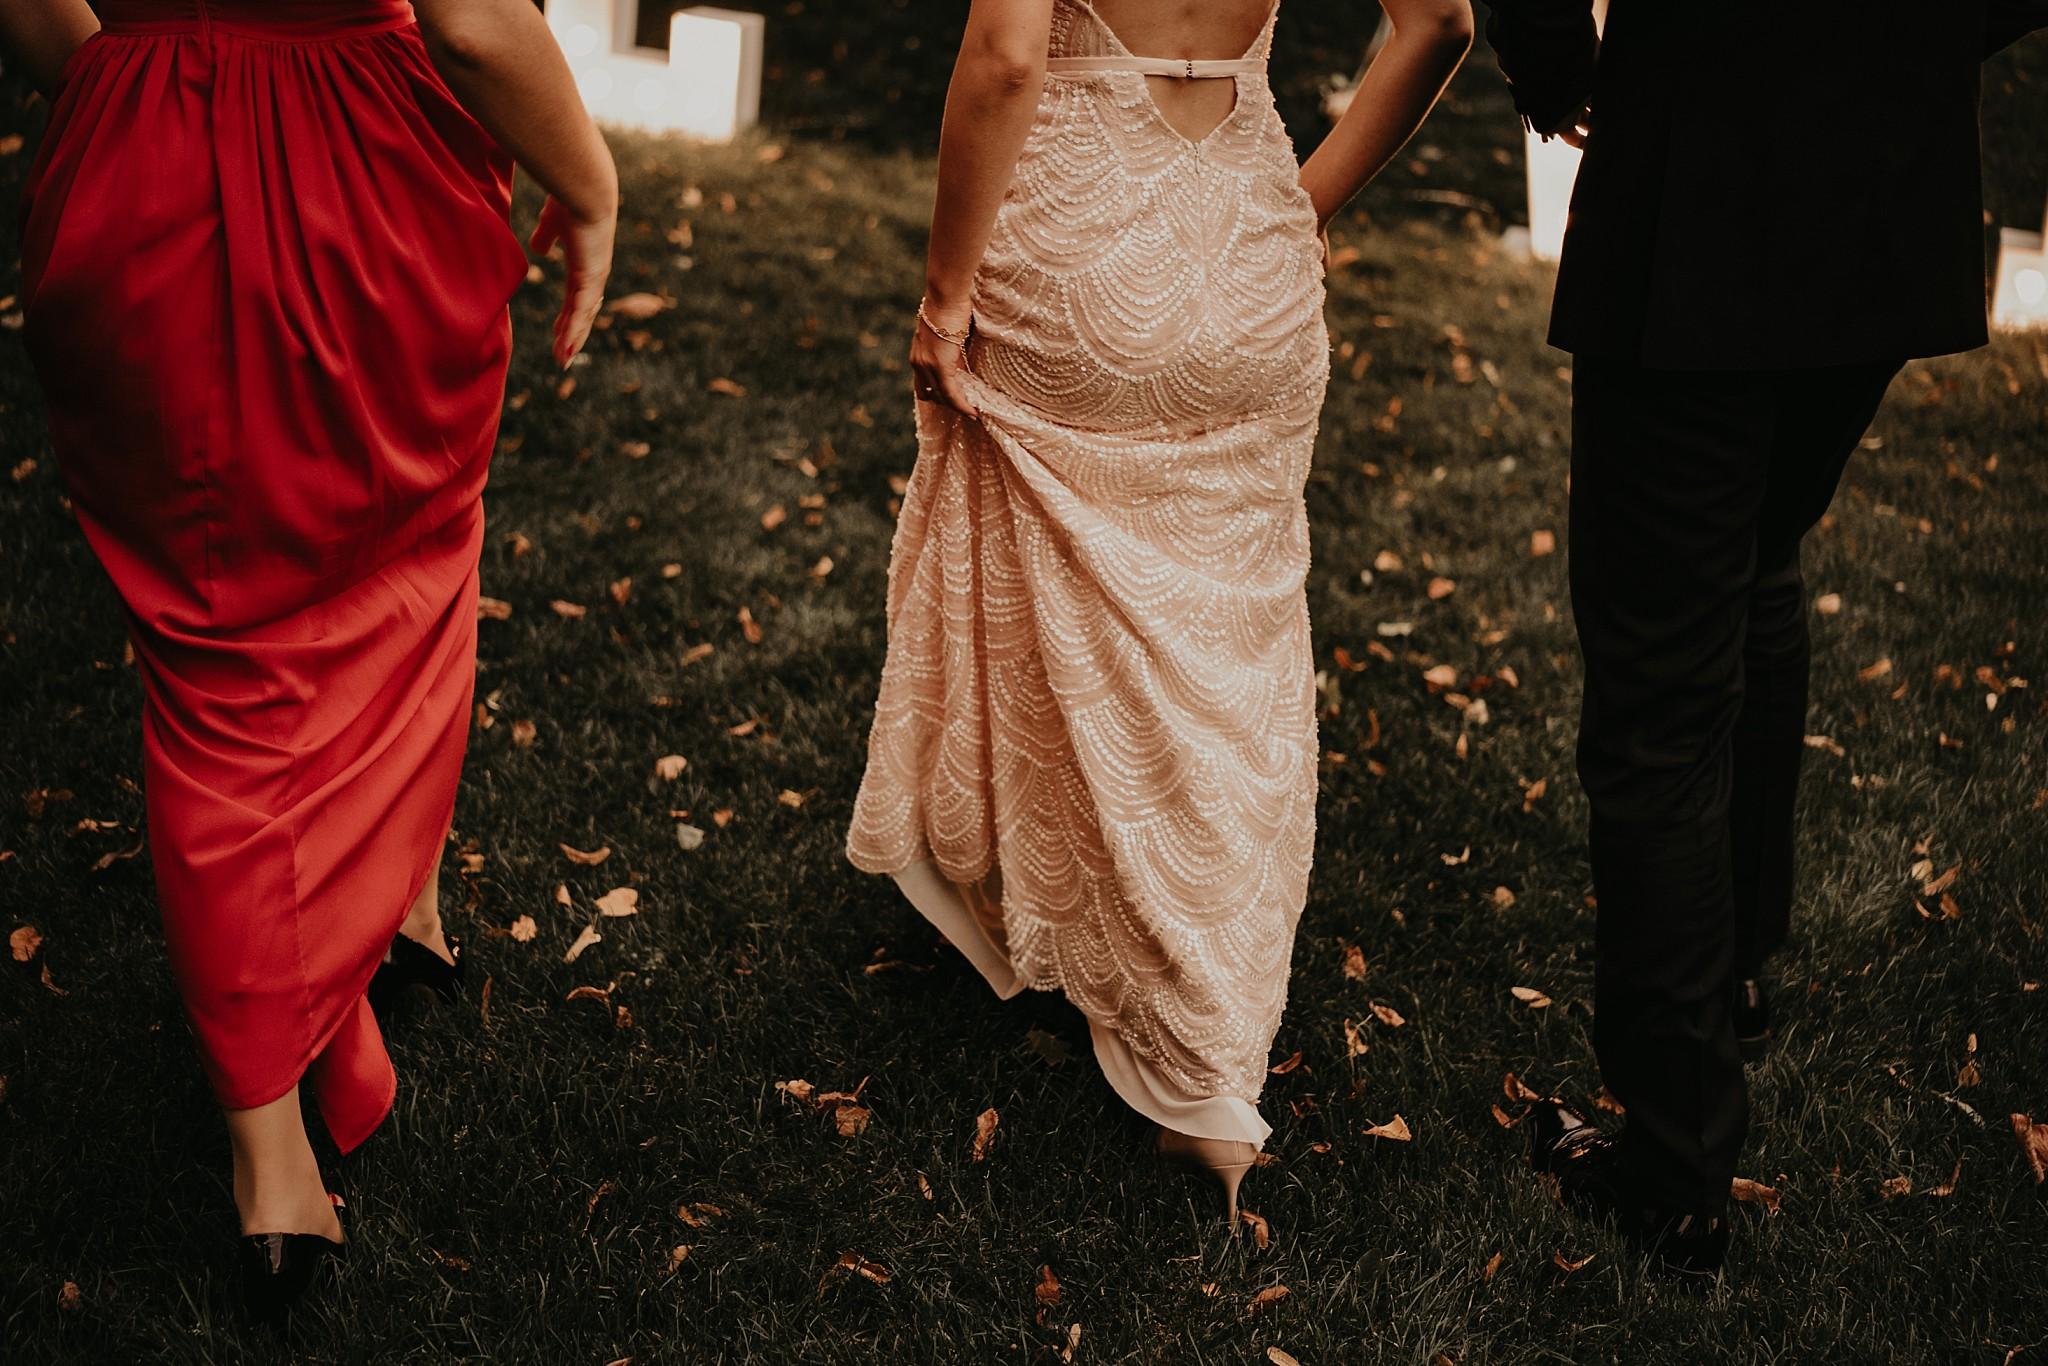 fotograf poznan wesele dobra truskawka piekne wesele pod poznaniem wesele w dobrej truskawce piekna para mloda slub marzen slub koronawirus slub listopad wesele koronawirus 330